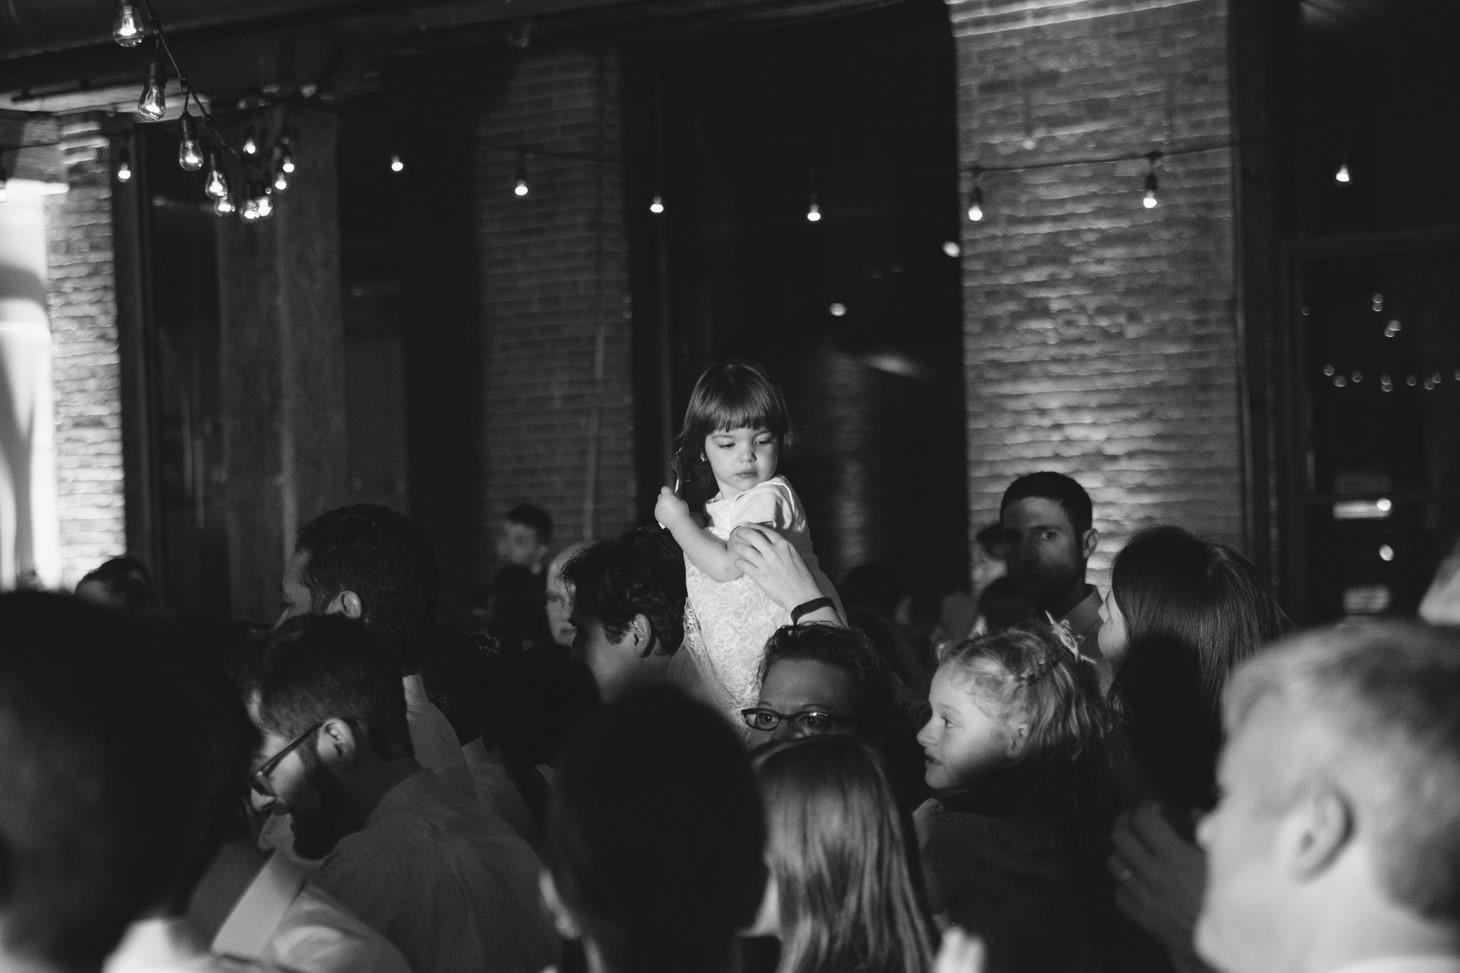 055-nyc-dumbo-loft-brooklyn-wedding-photographer-smitten-chickens-photo-.jpg